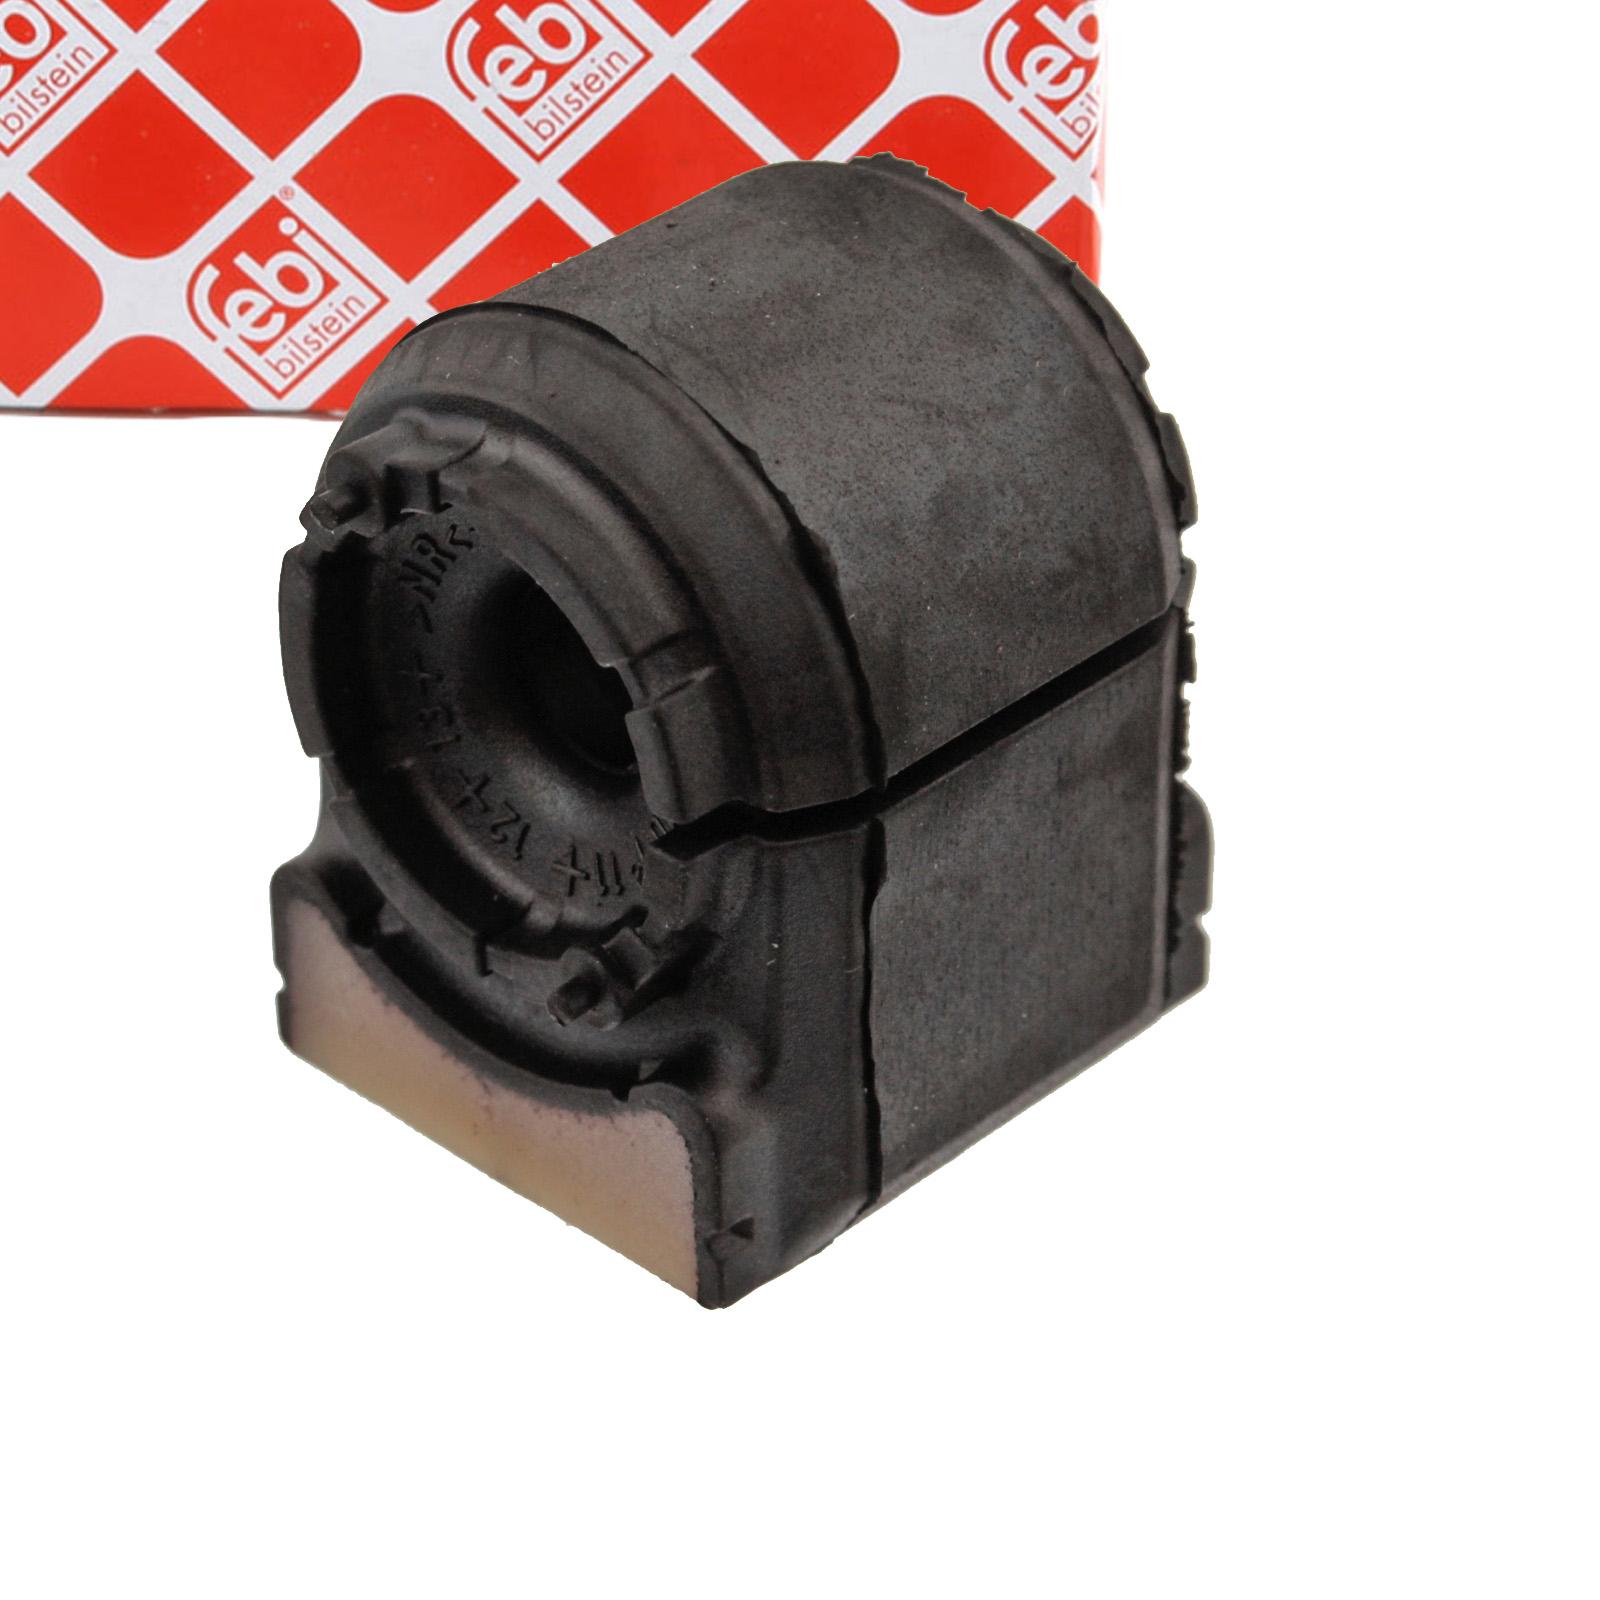 2x FEBI 45869 Stabilisatorlager MERCEDES Viano Vito / Mixto W639 hinten 6393261281